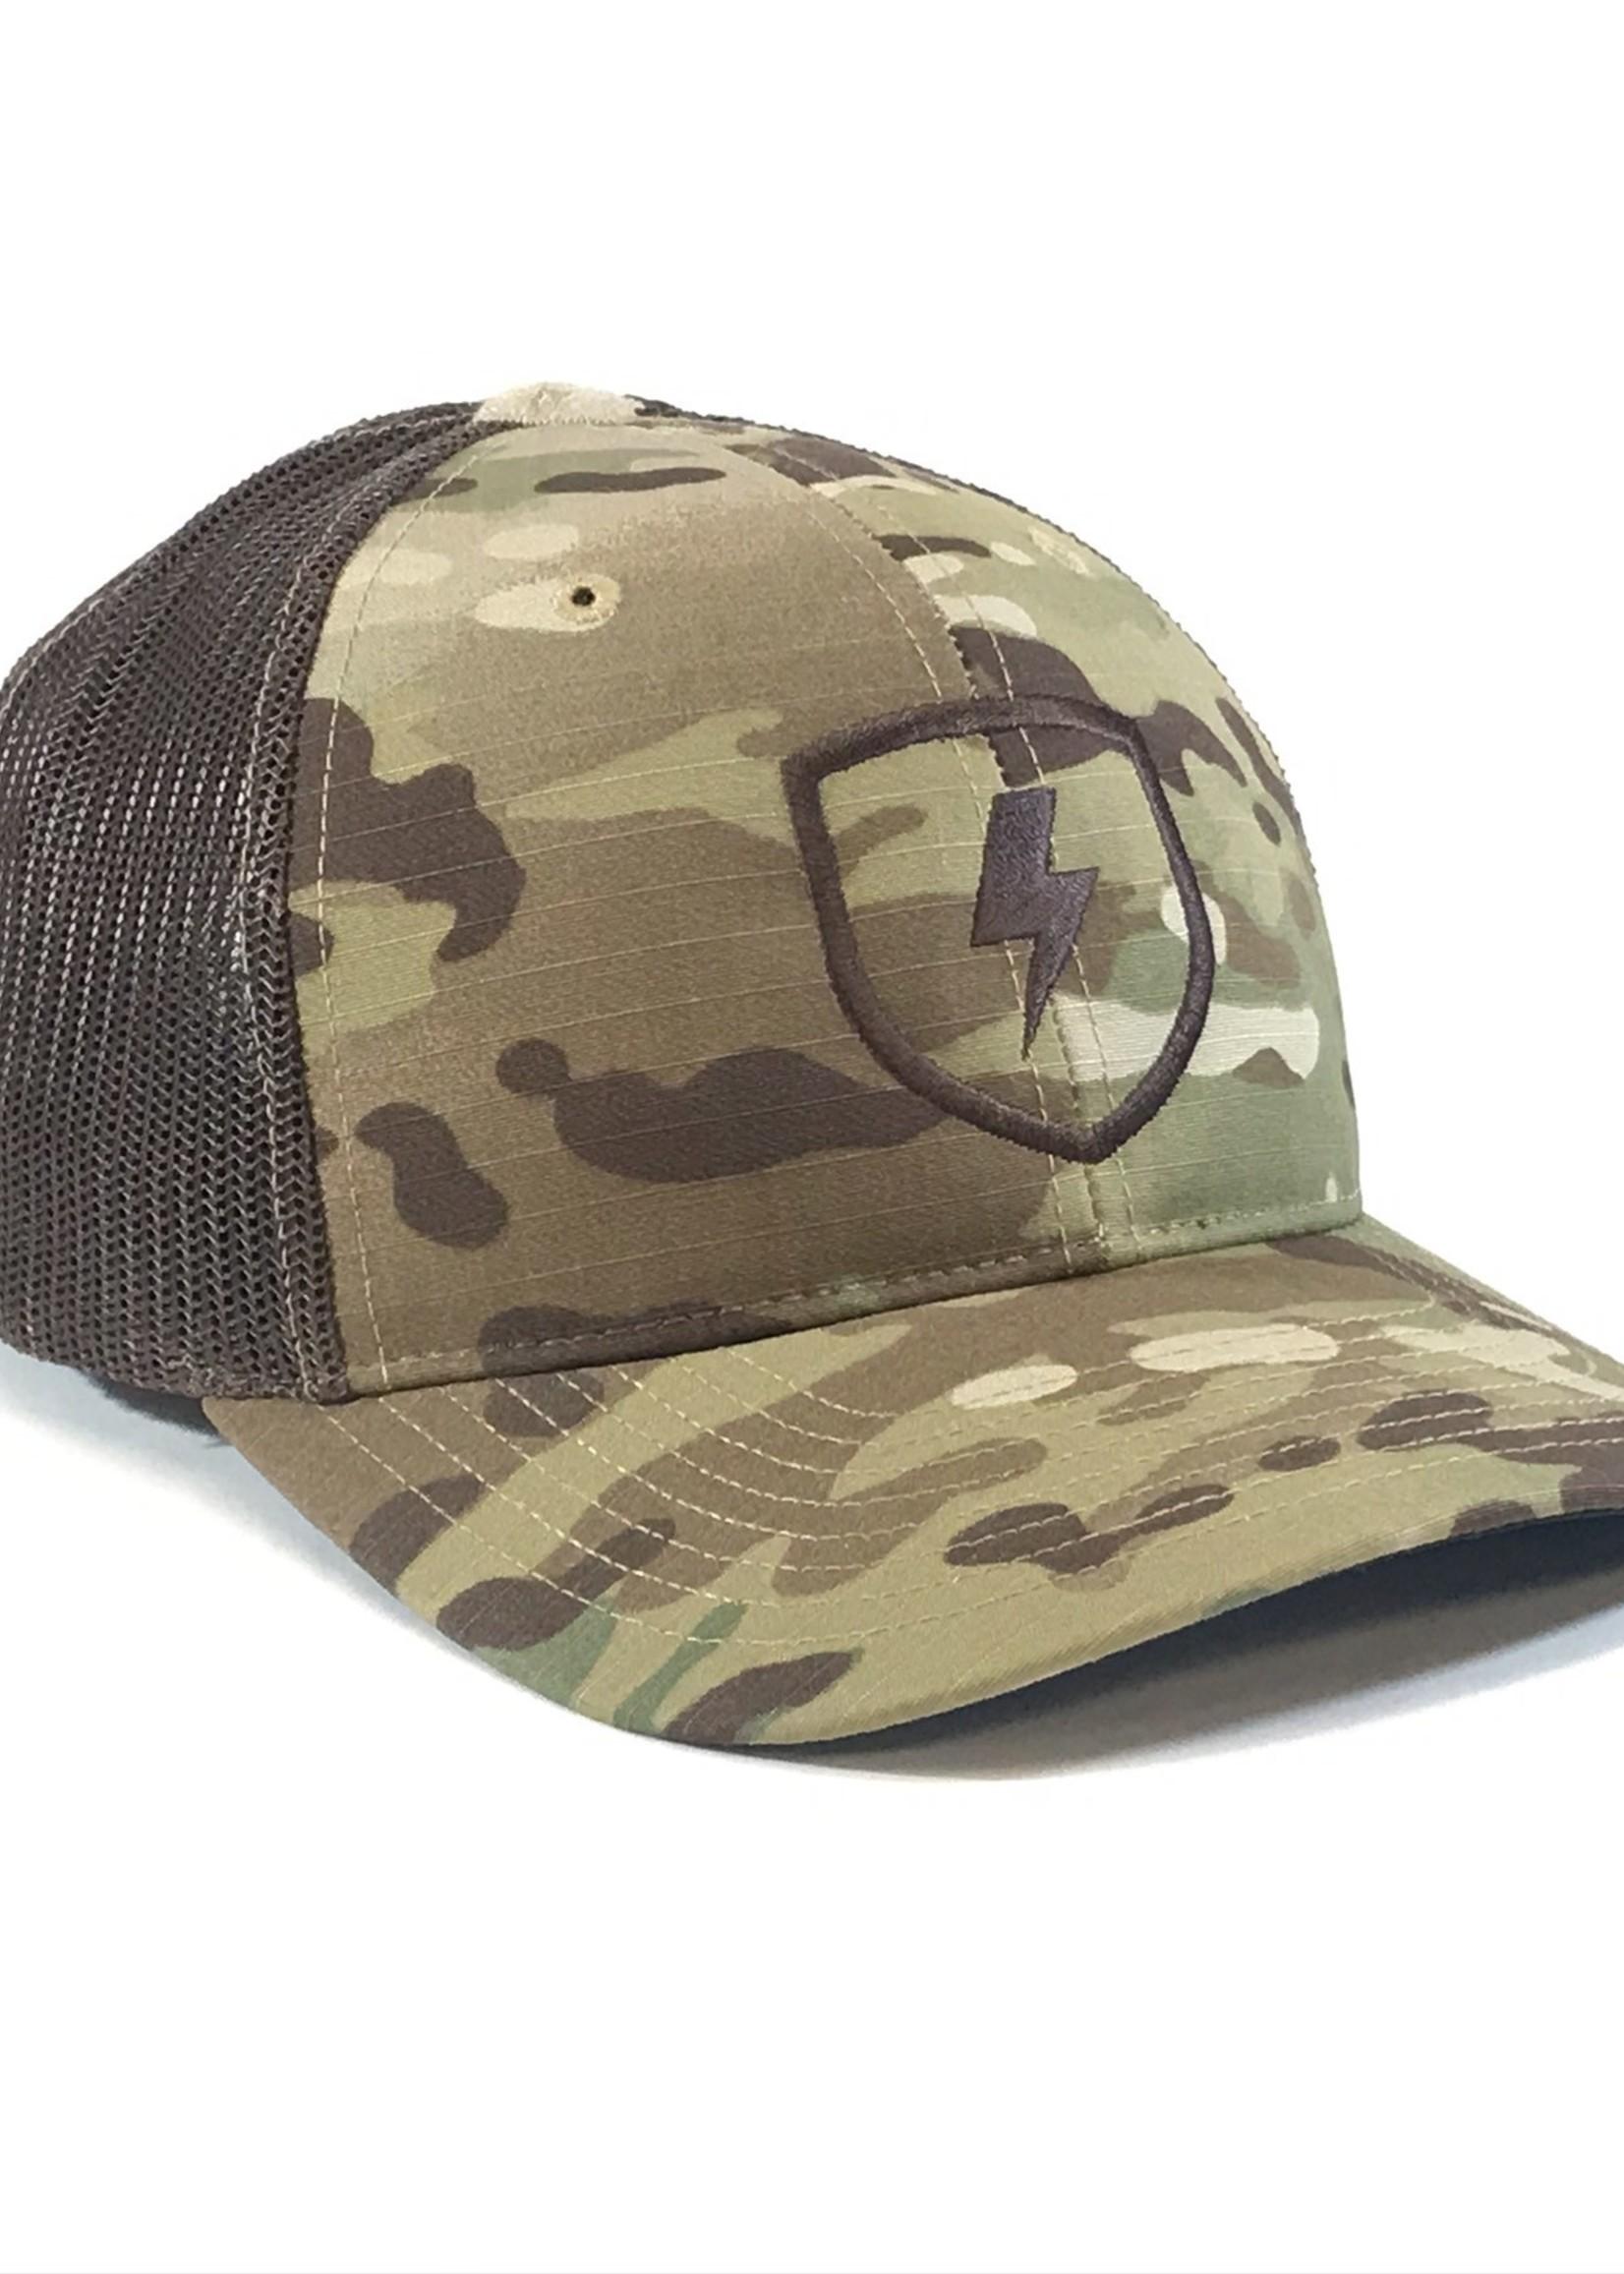 Defender Outdoors Shield Multicam Trucker Hat